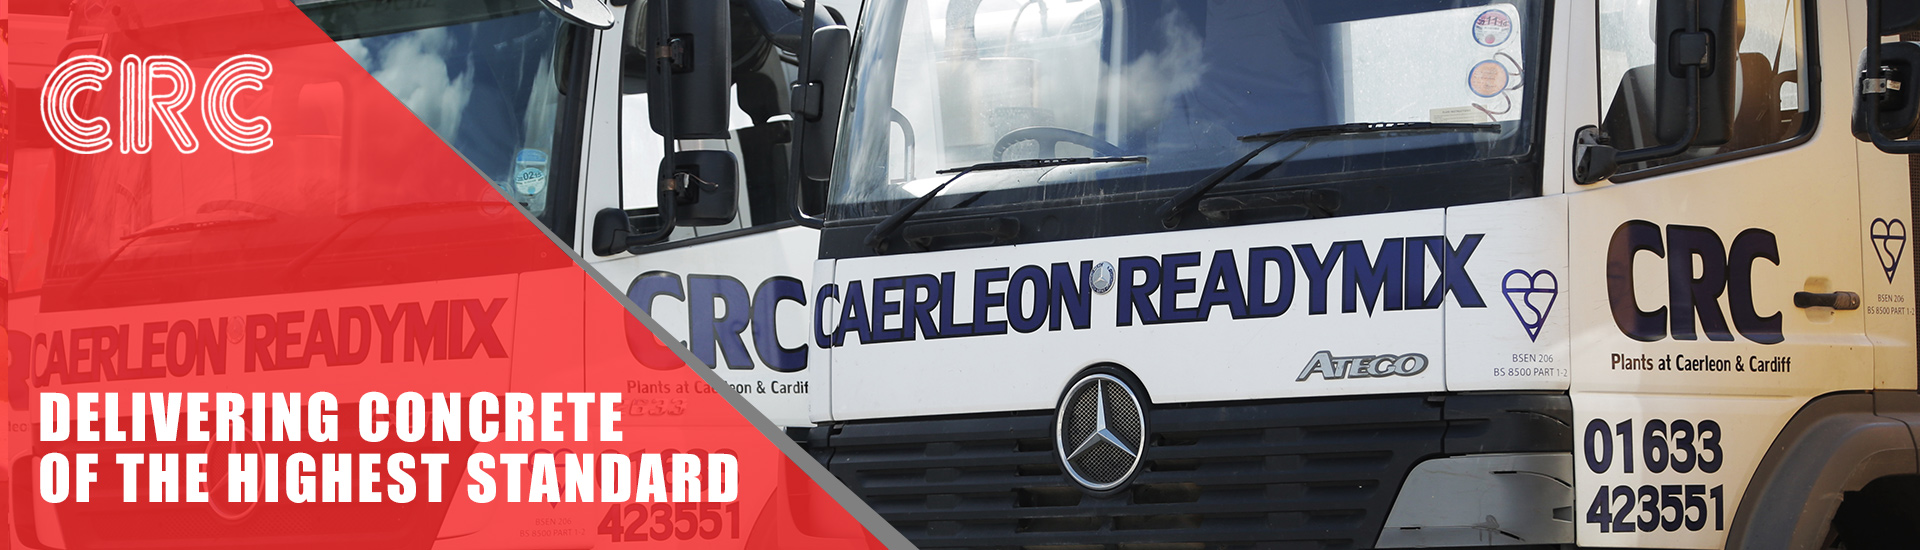 CaerleonRC-HomeSlider_004